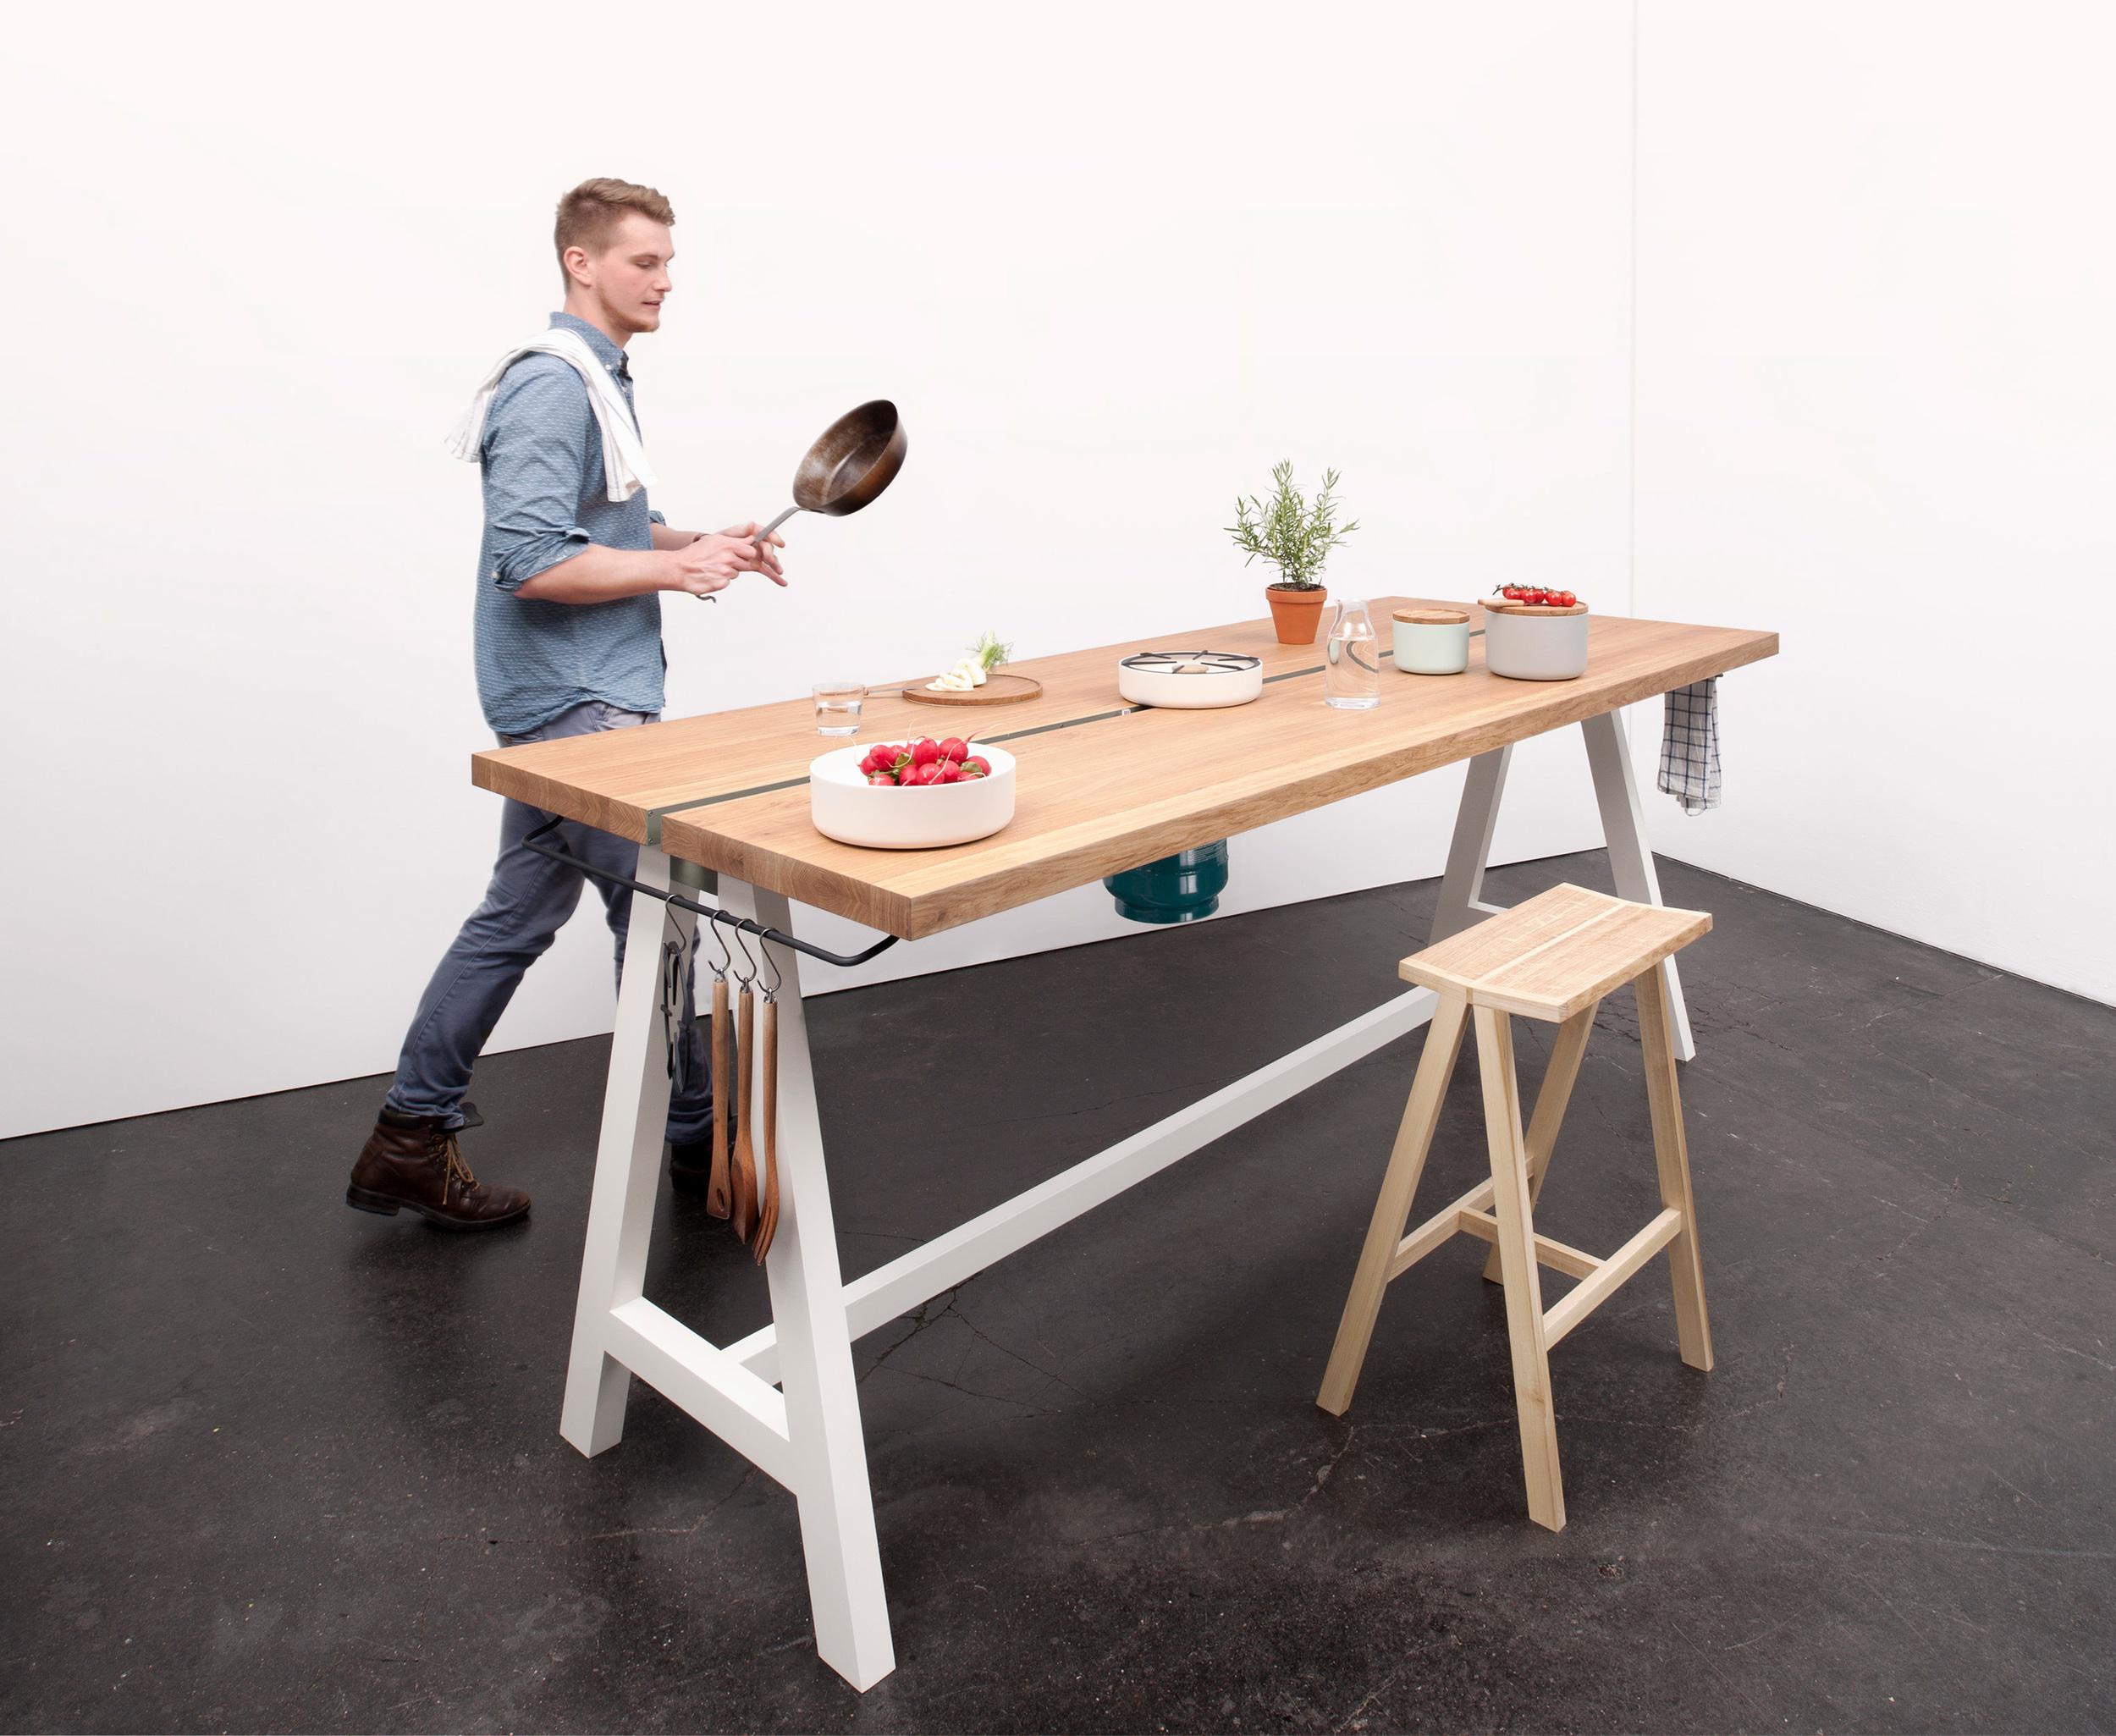 Studio-MoritzPutzier_The-Cooking-Table-16.jpg